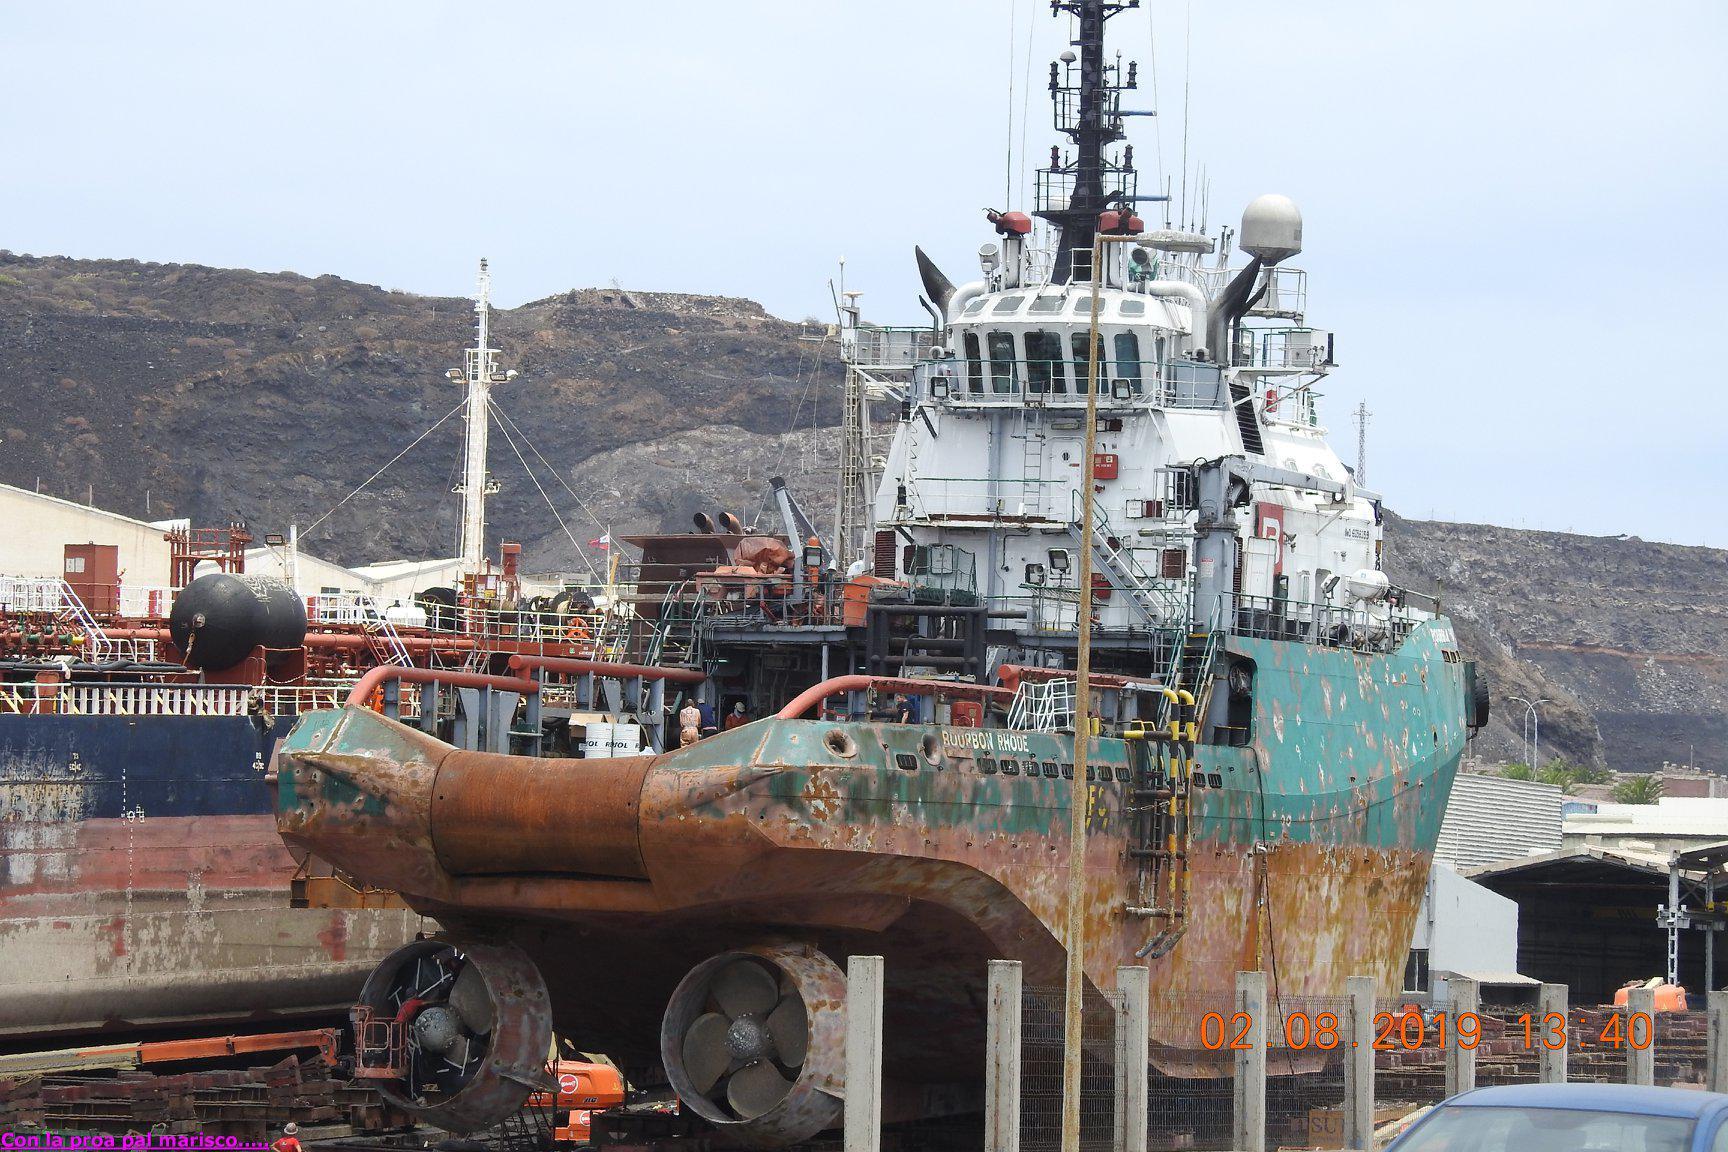 Bourbon Rhode snimljen u kolovozu u Las Palmas de Gran Canaria, brodogradilište Zamakona